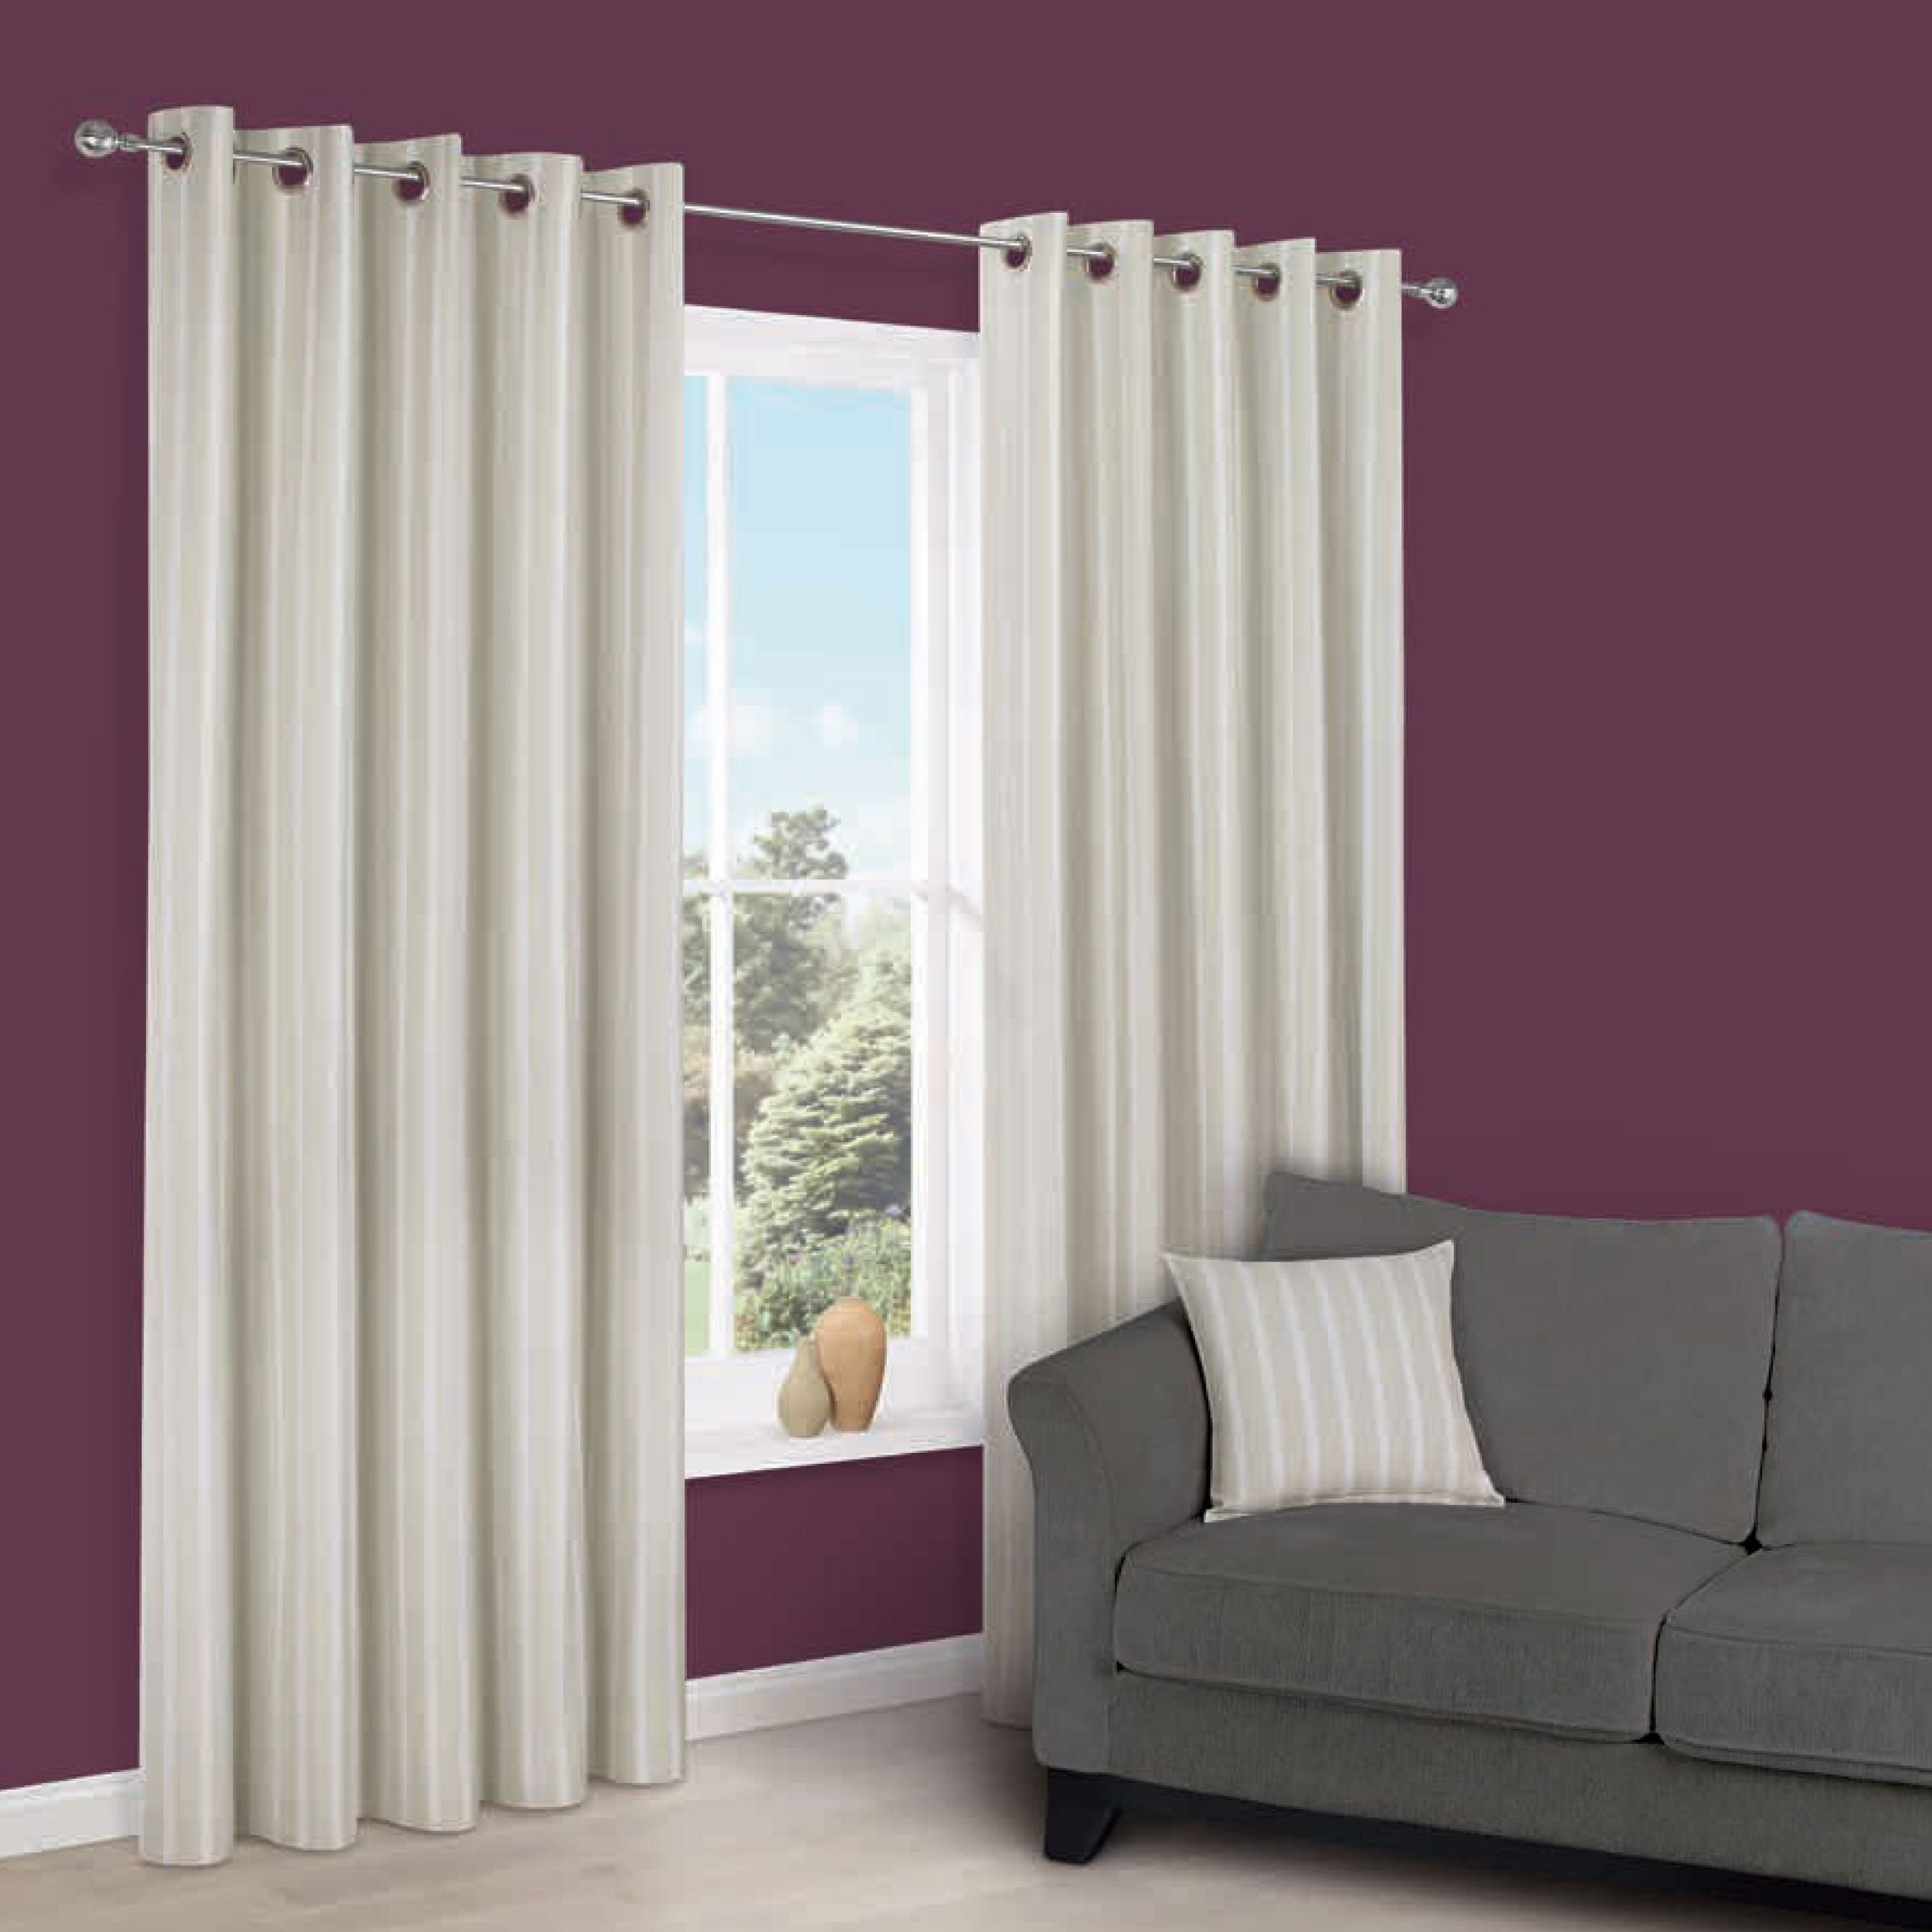 Cherelle Limestone Stripe Eyelet Lined Curtains (w)167 Cm (l)167 Cm